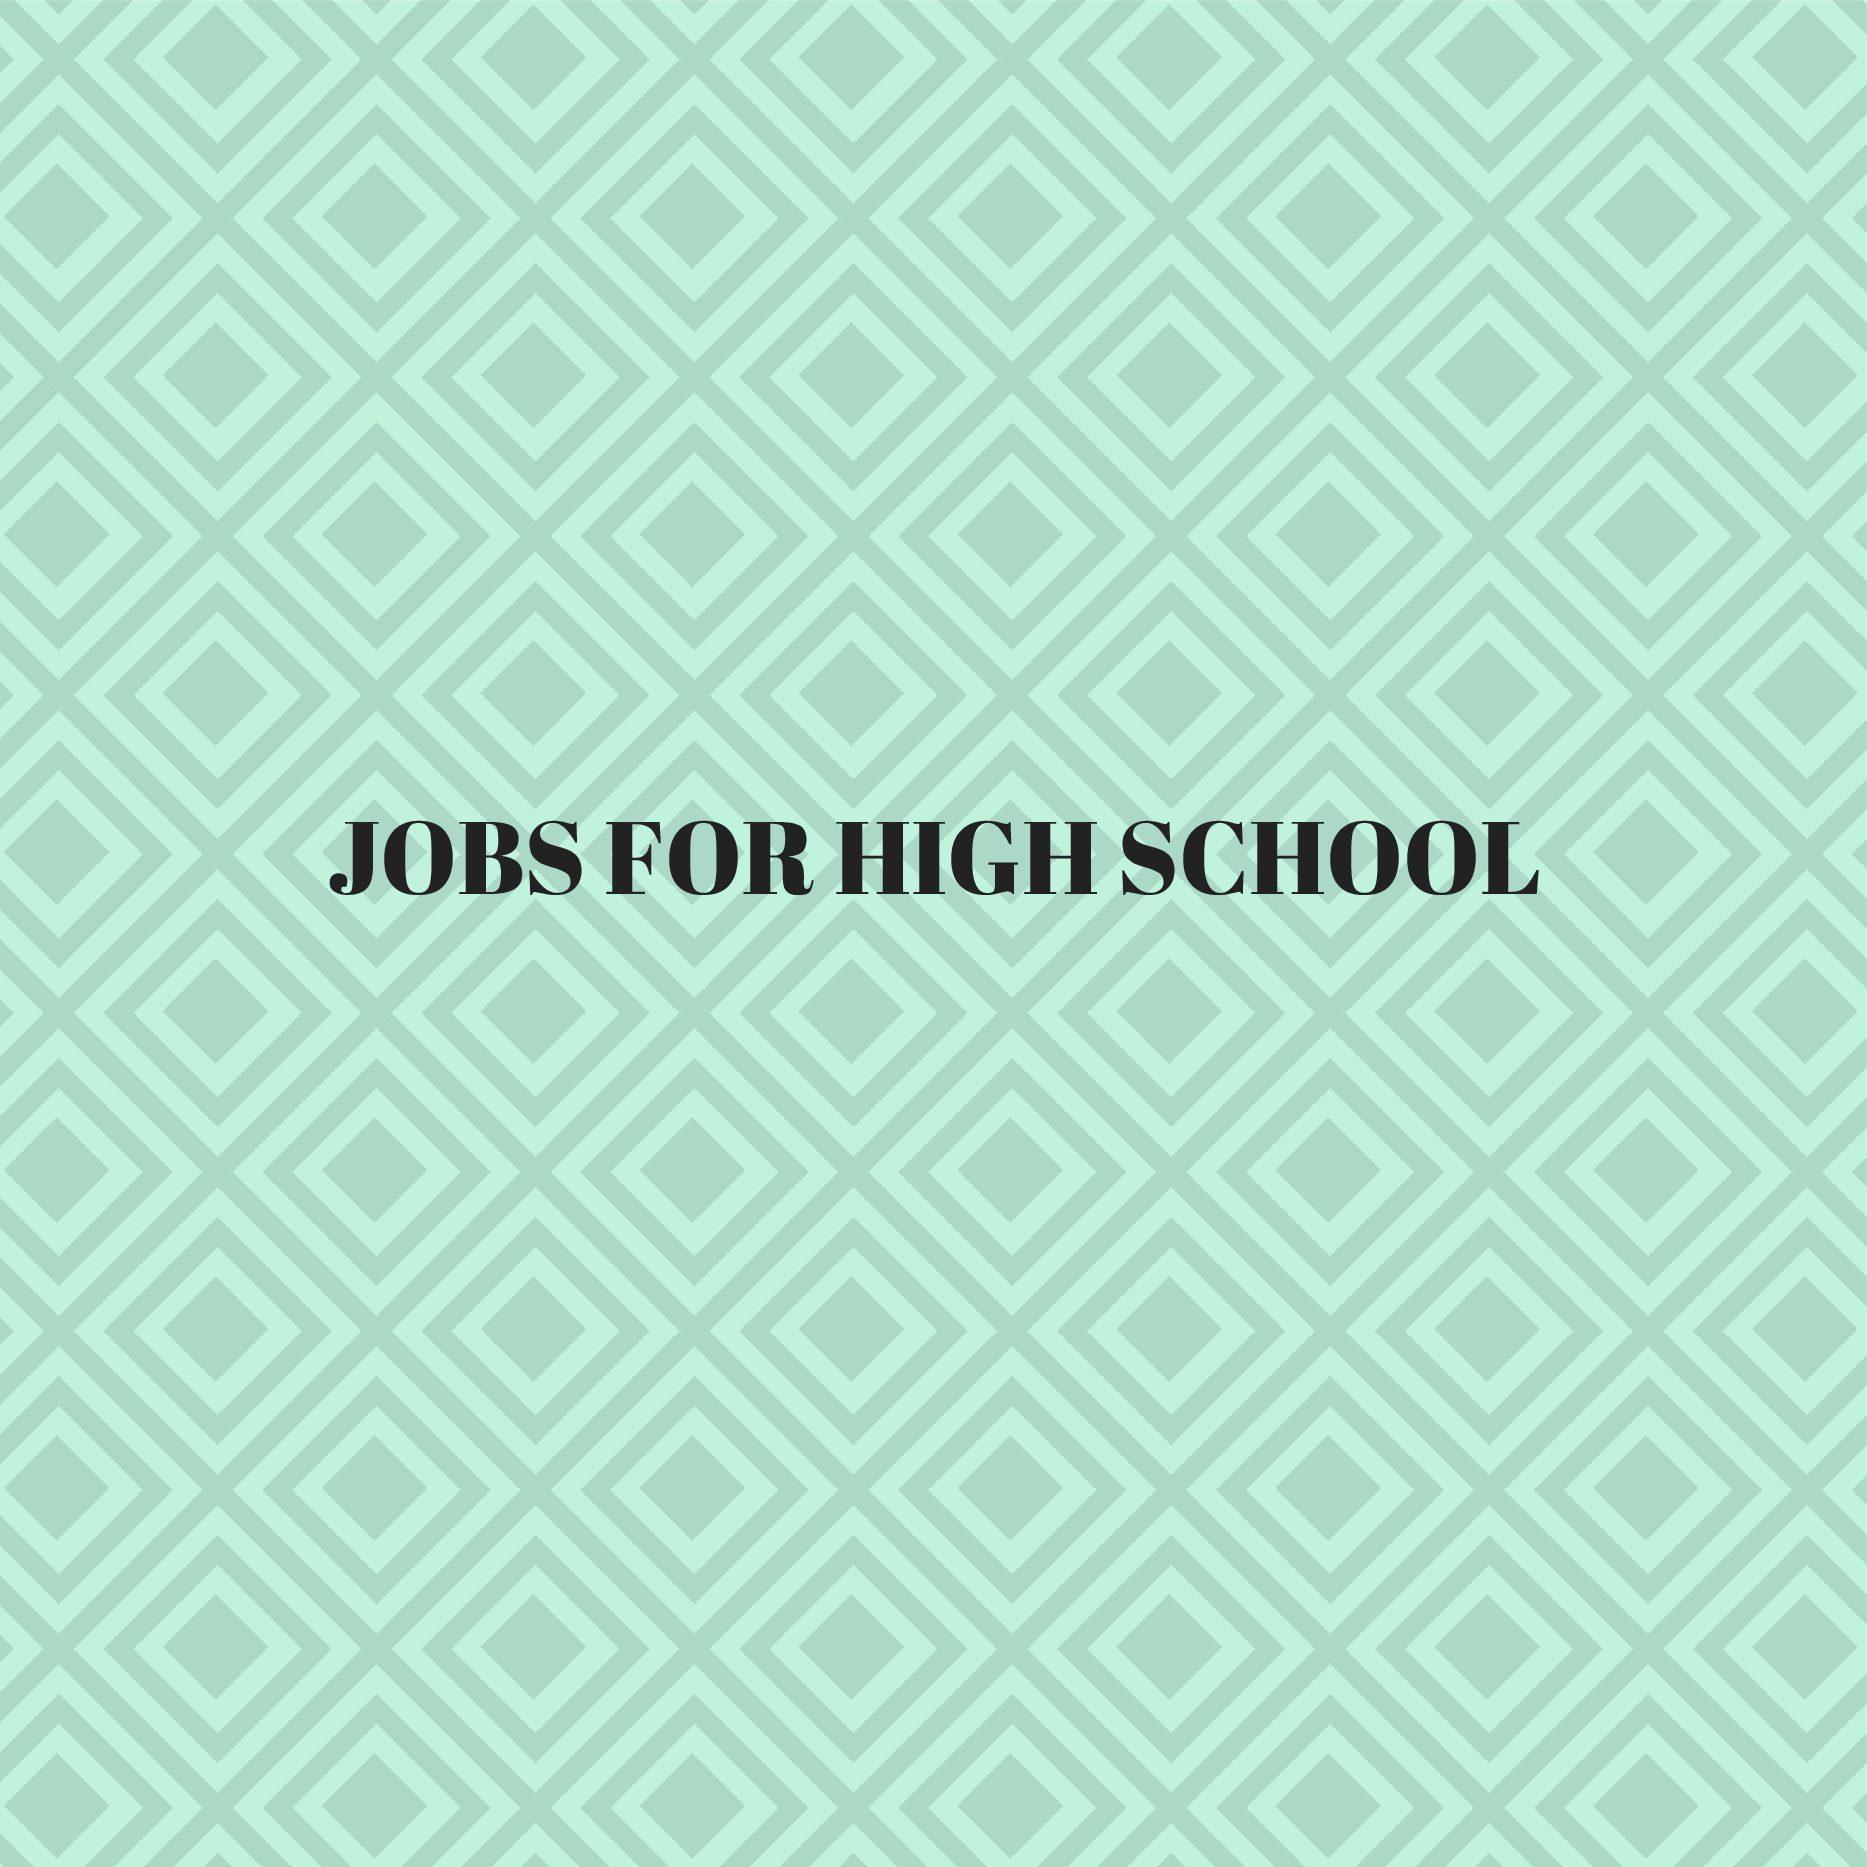 Fun Jobs For High School